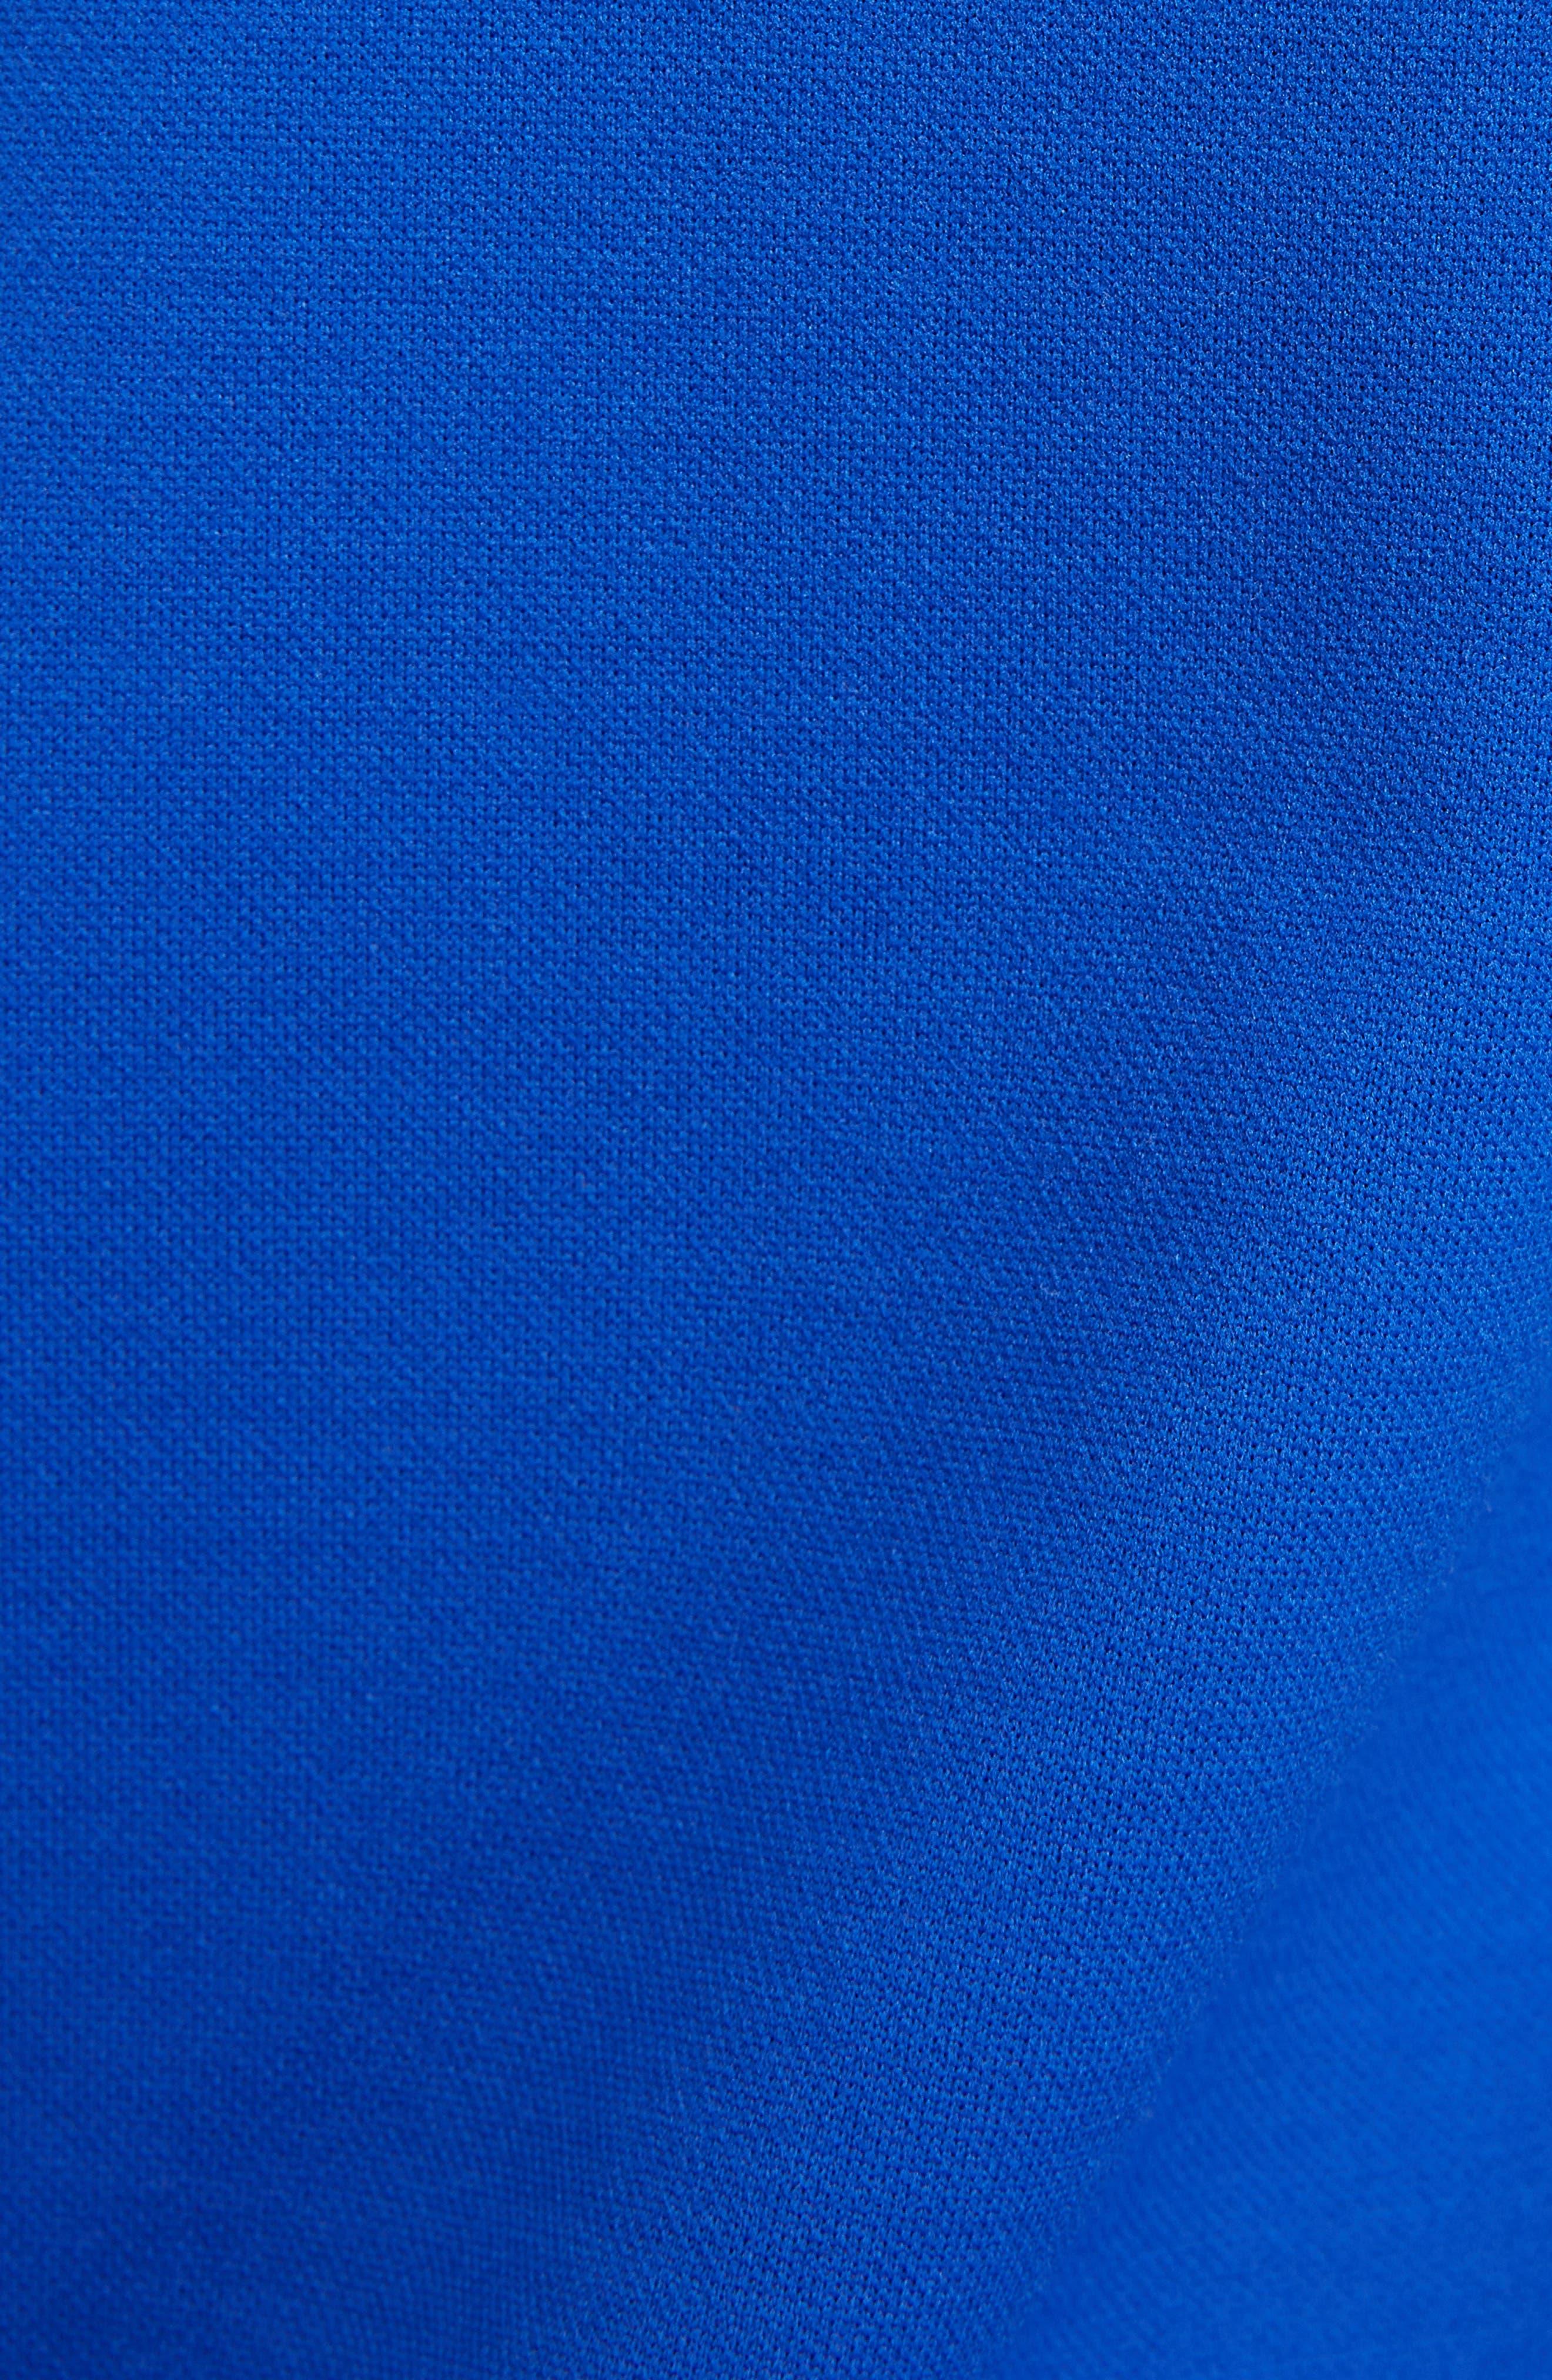 KENZO, Jacquard Raglan Sweatshirt, Alternate thumbnail 5, color, FRENCH BLUE